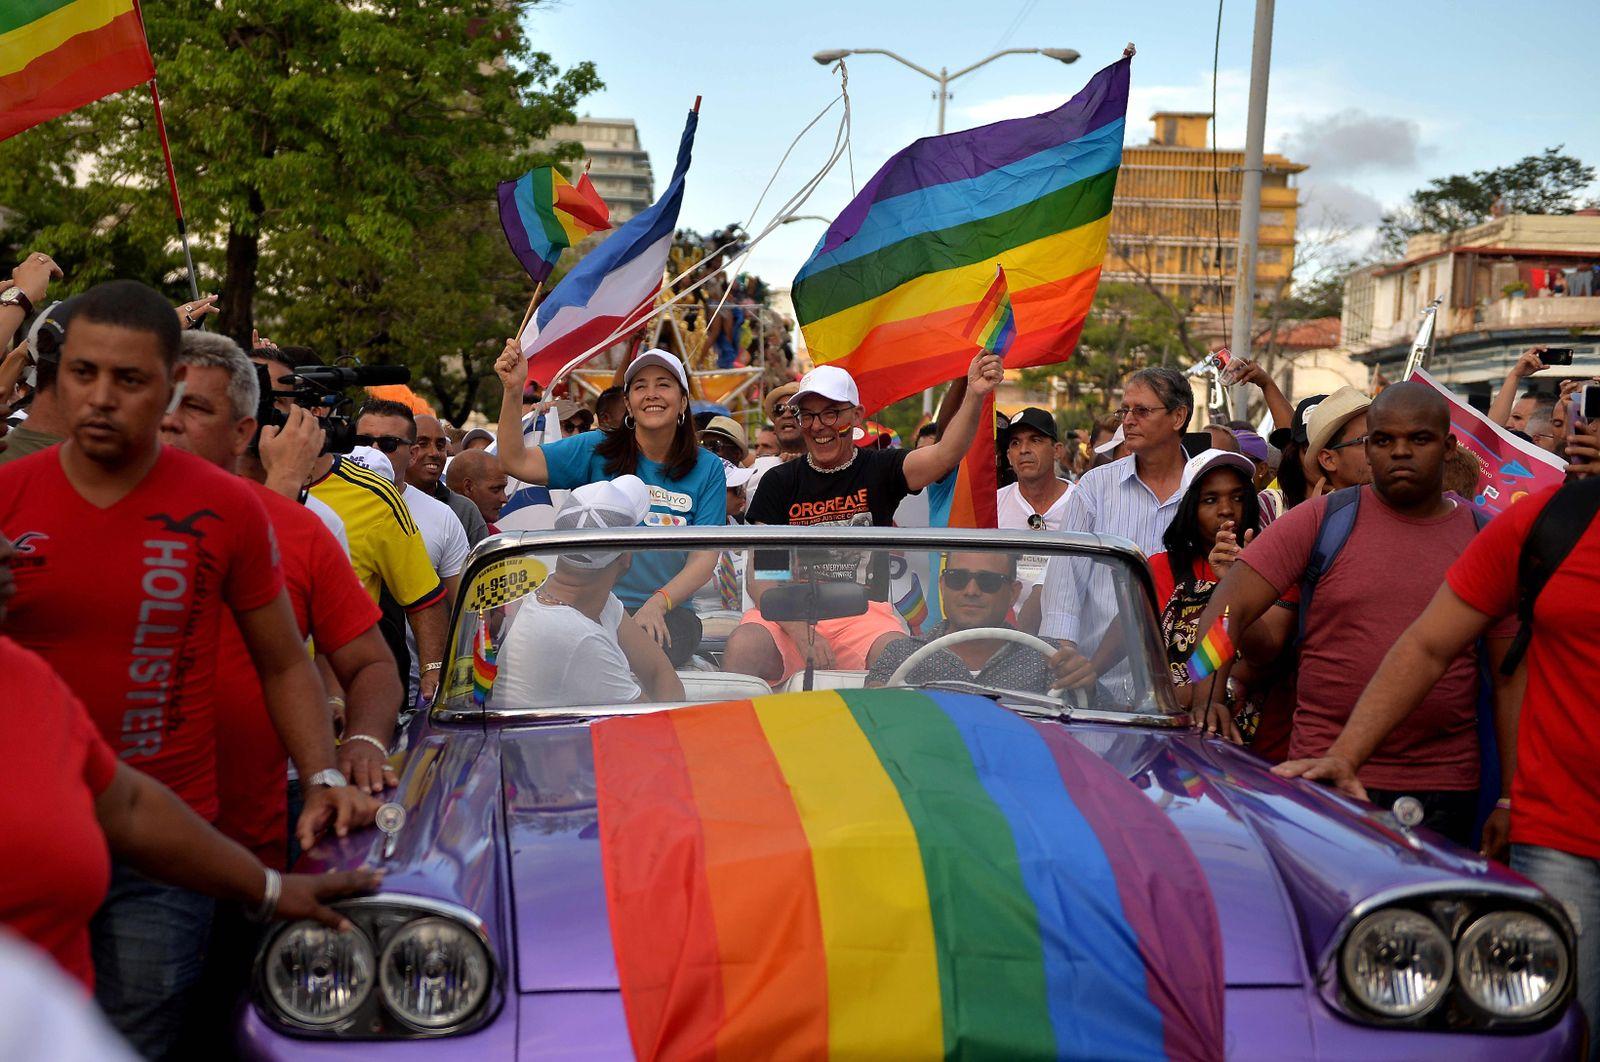 TOPSHOT-CUBA-GAY-PARADE